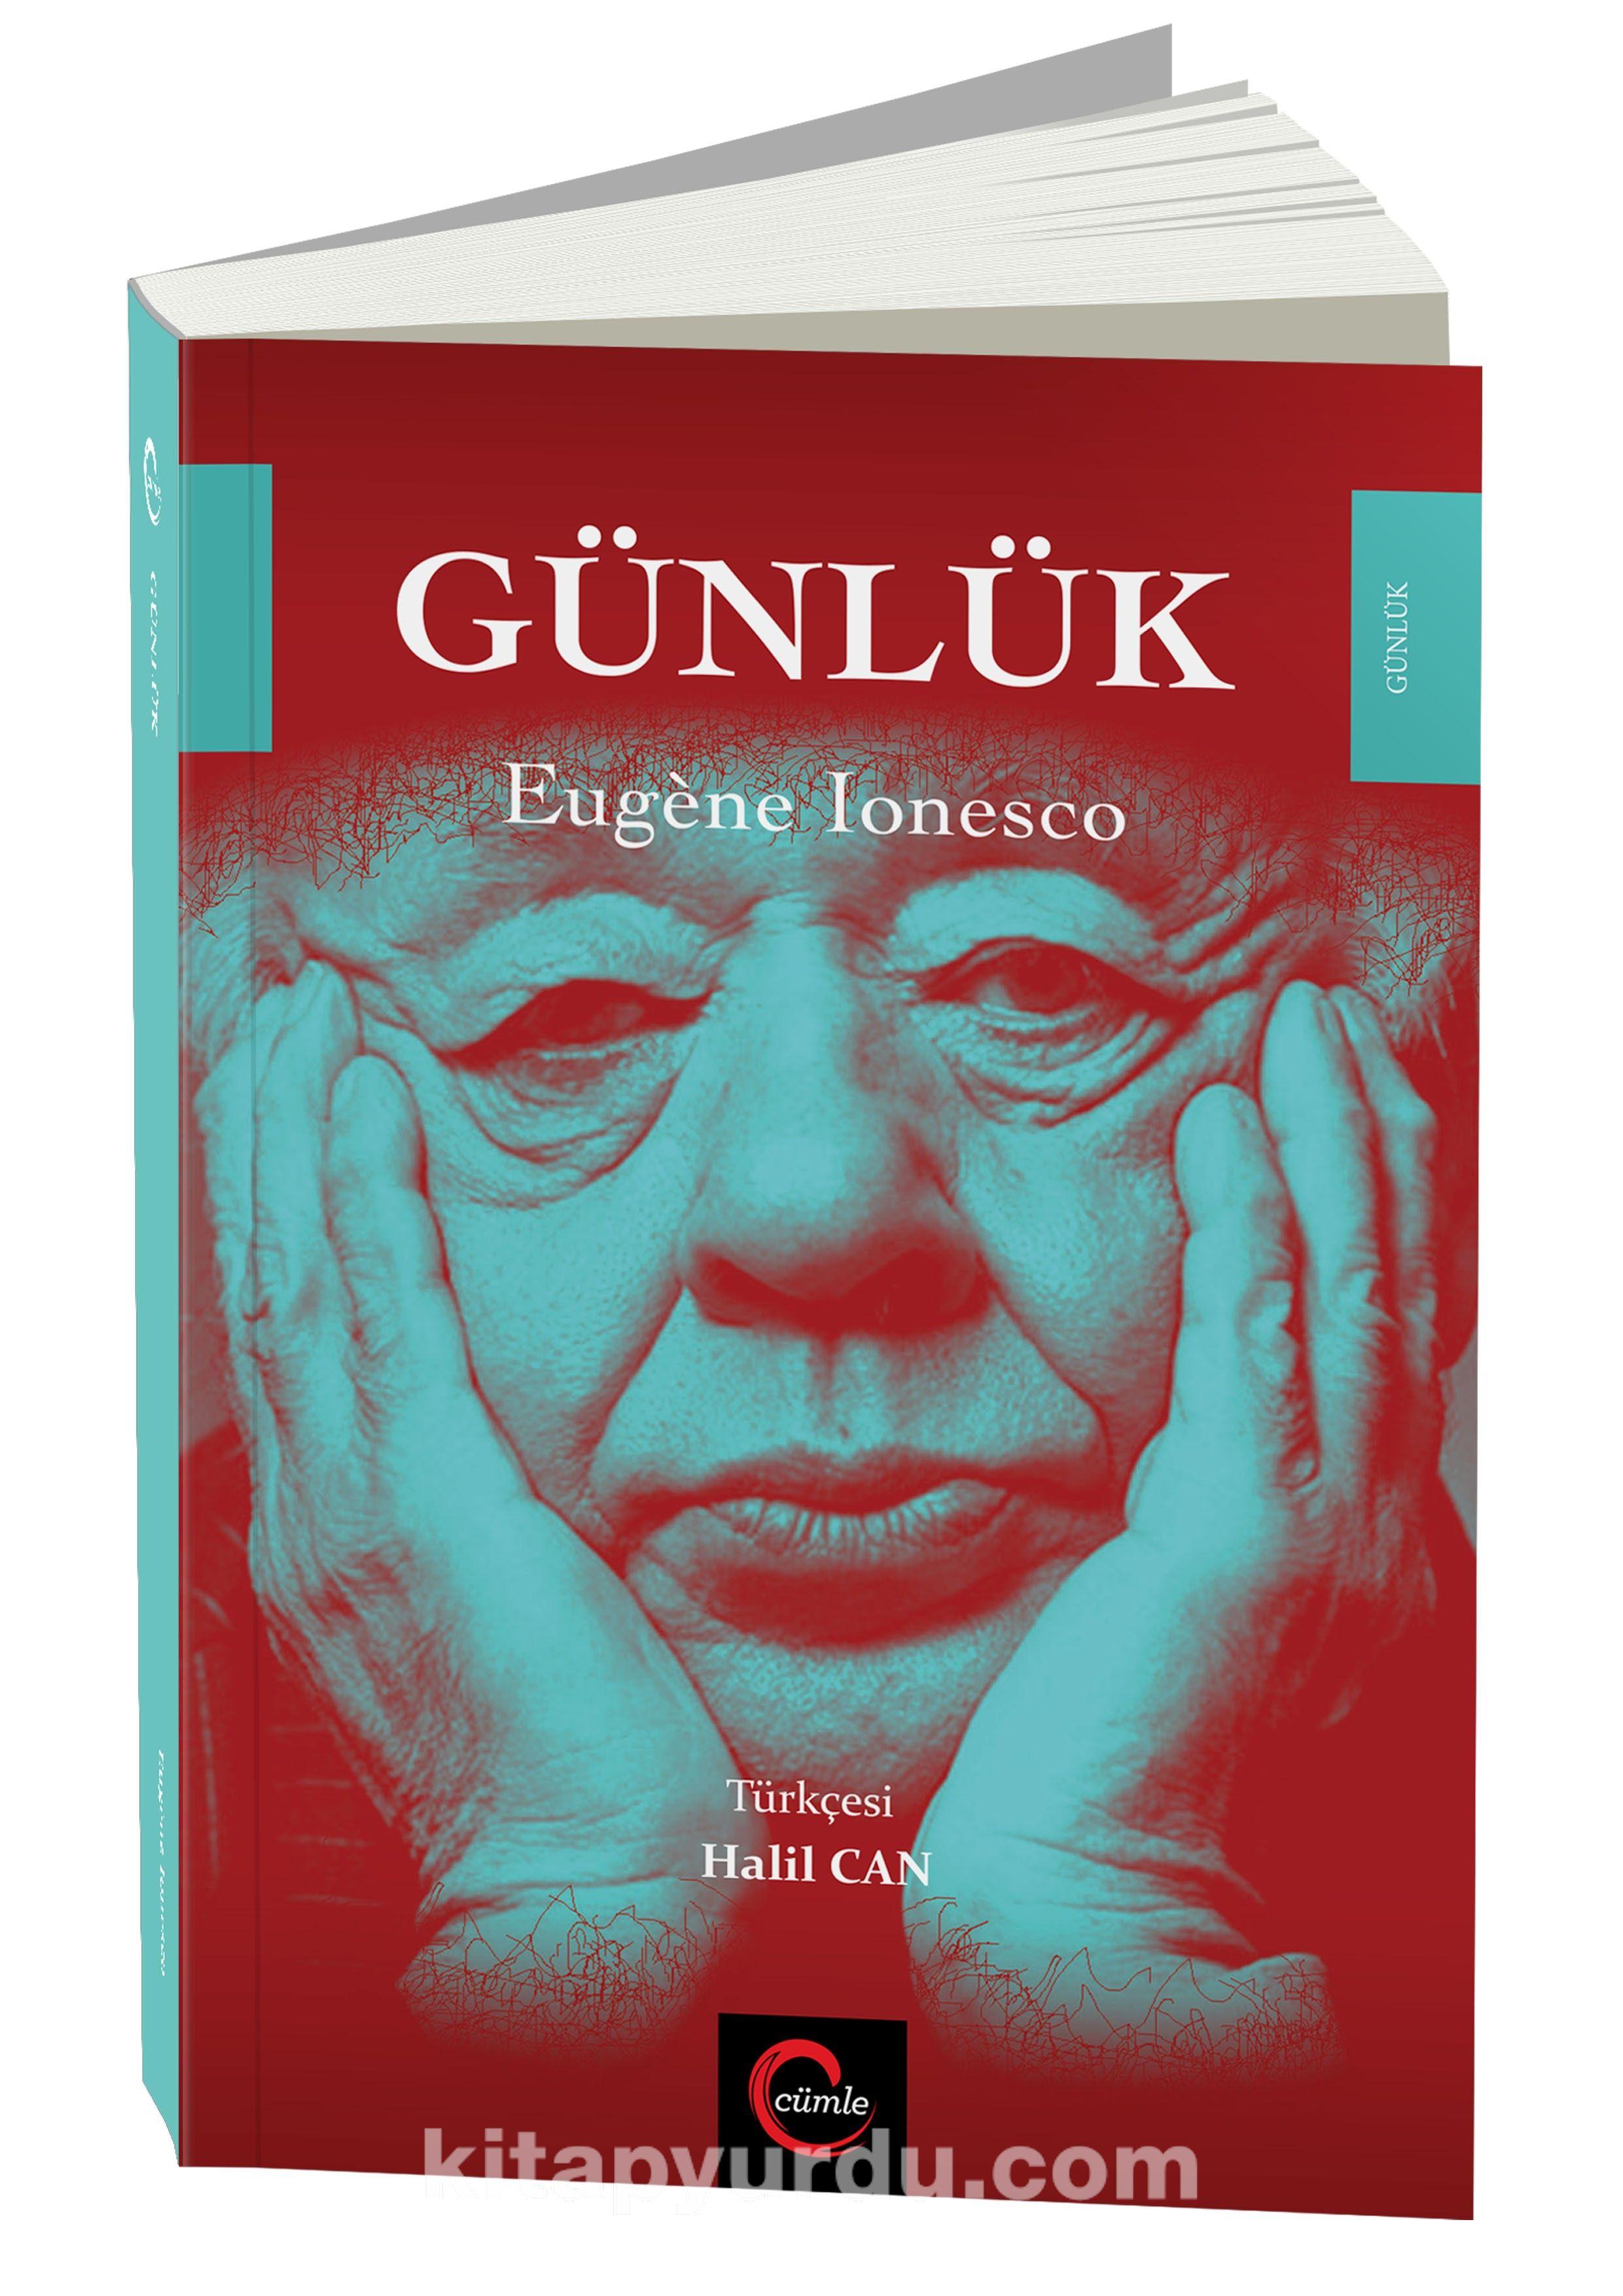 Günlük - Eugene Ionesco pdf epub